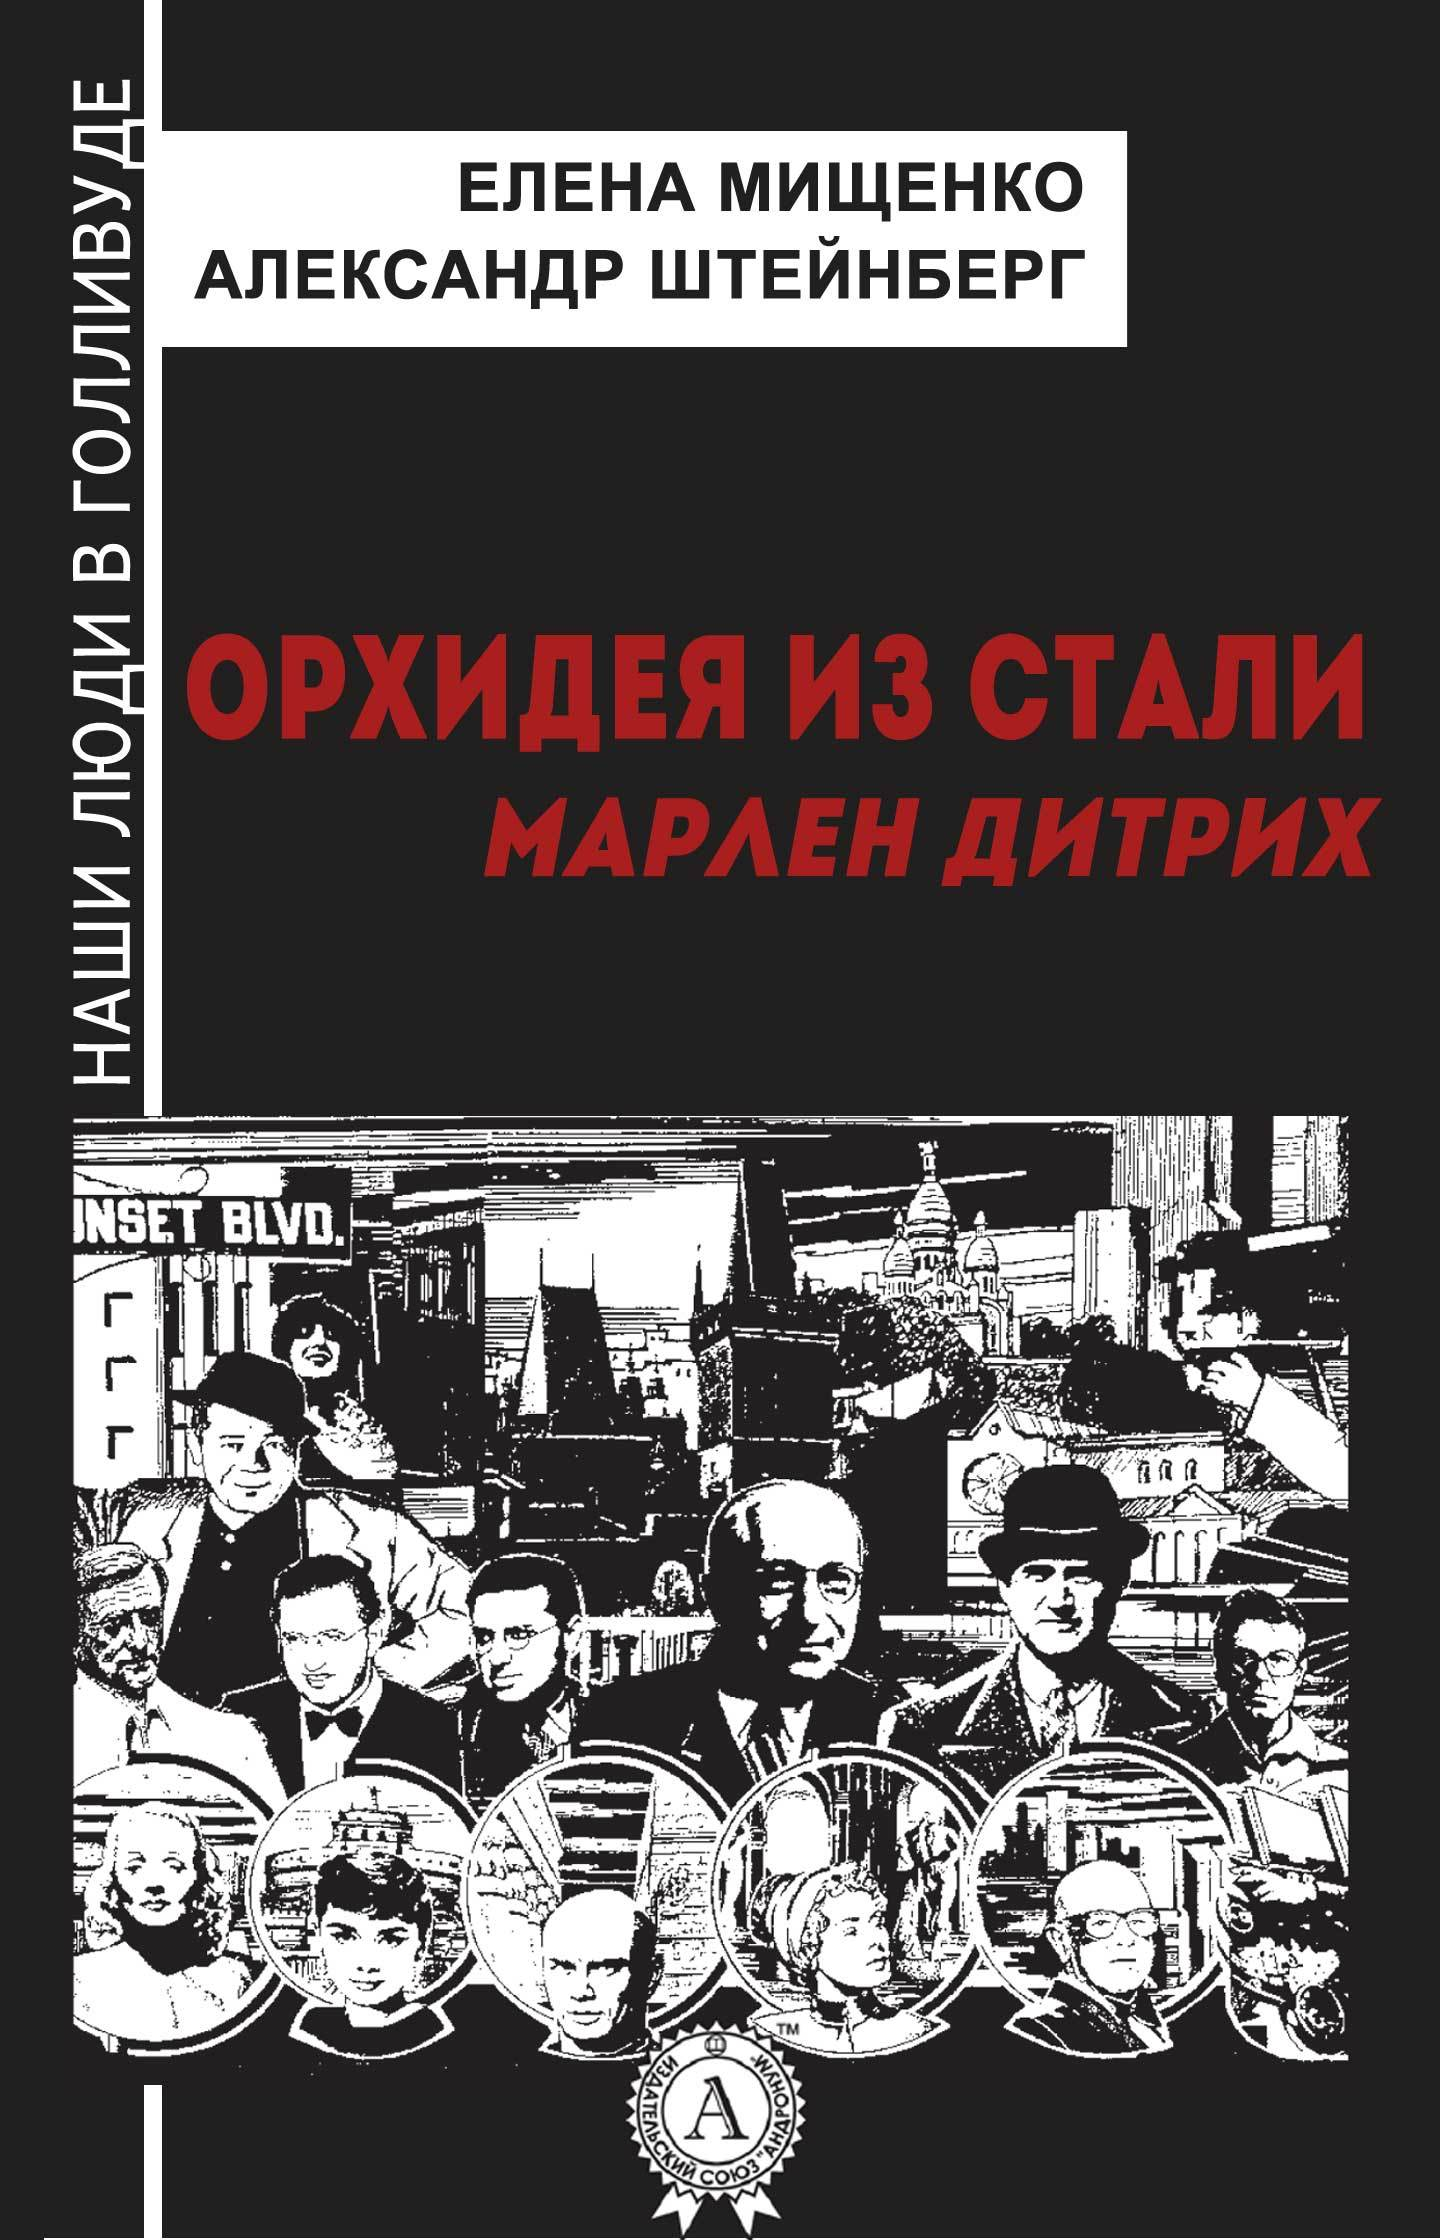 Елена Мищенко, Александр Штейнберг - Орхидея из стали. Марлен Дитрих